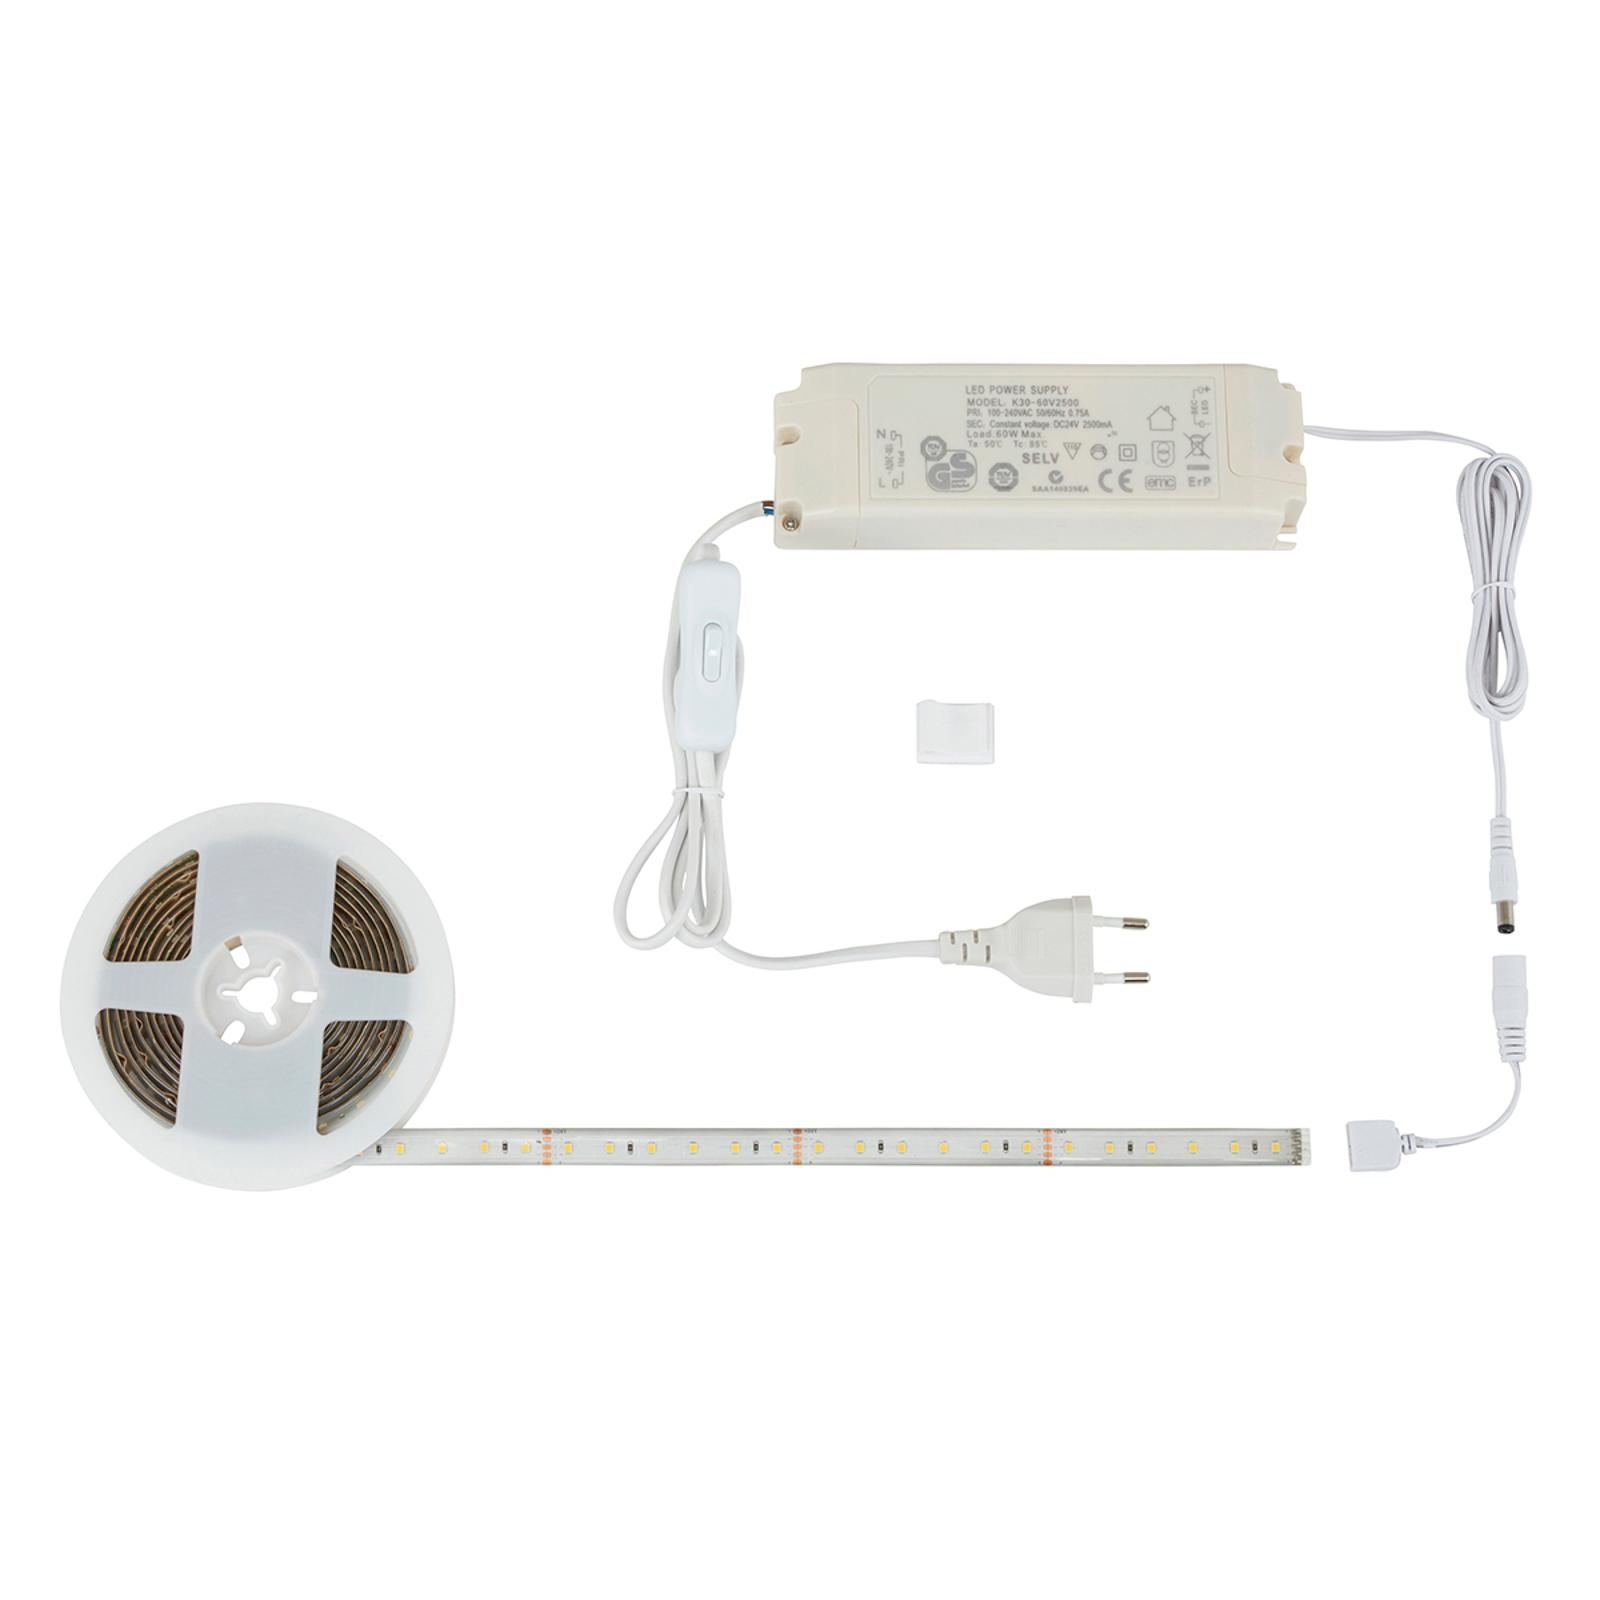 Universalhvit LED-stripe Rio, 3 m